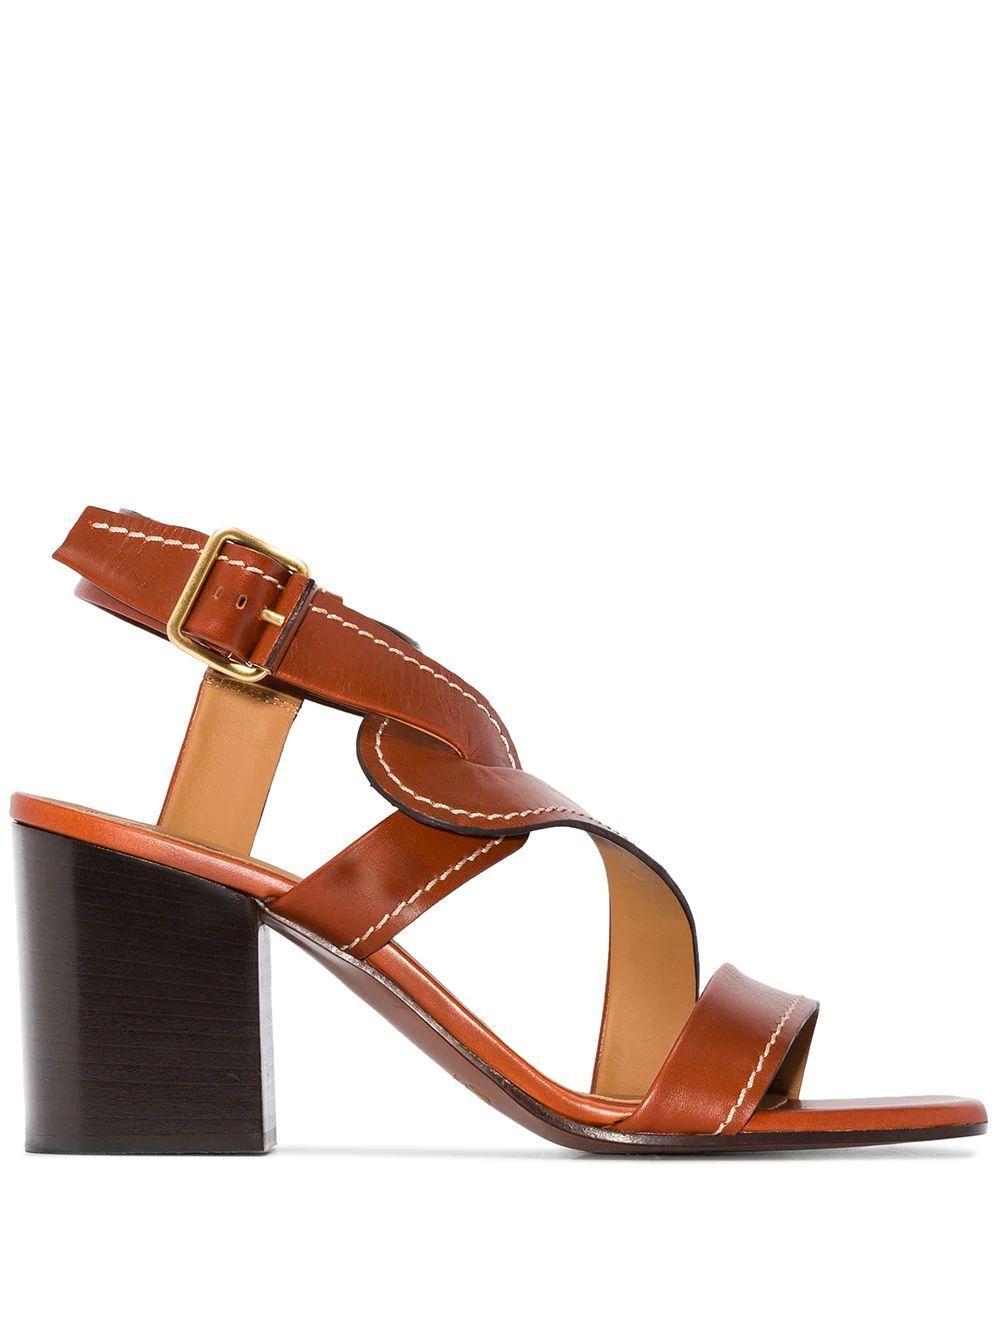 Candice Shiny 70mm Block Heel Sandal Item # CHC20S2779127S